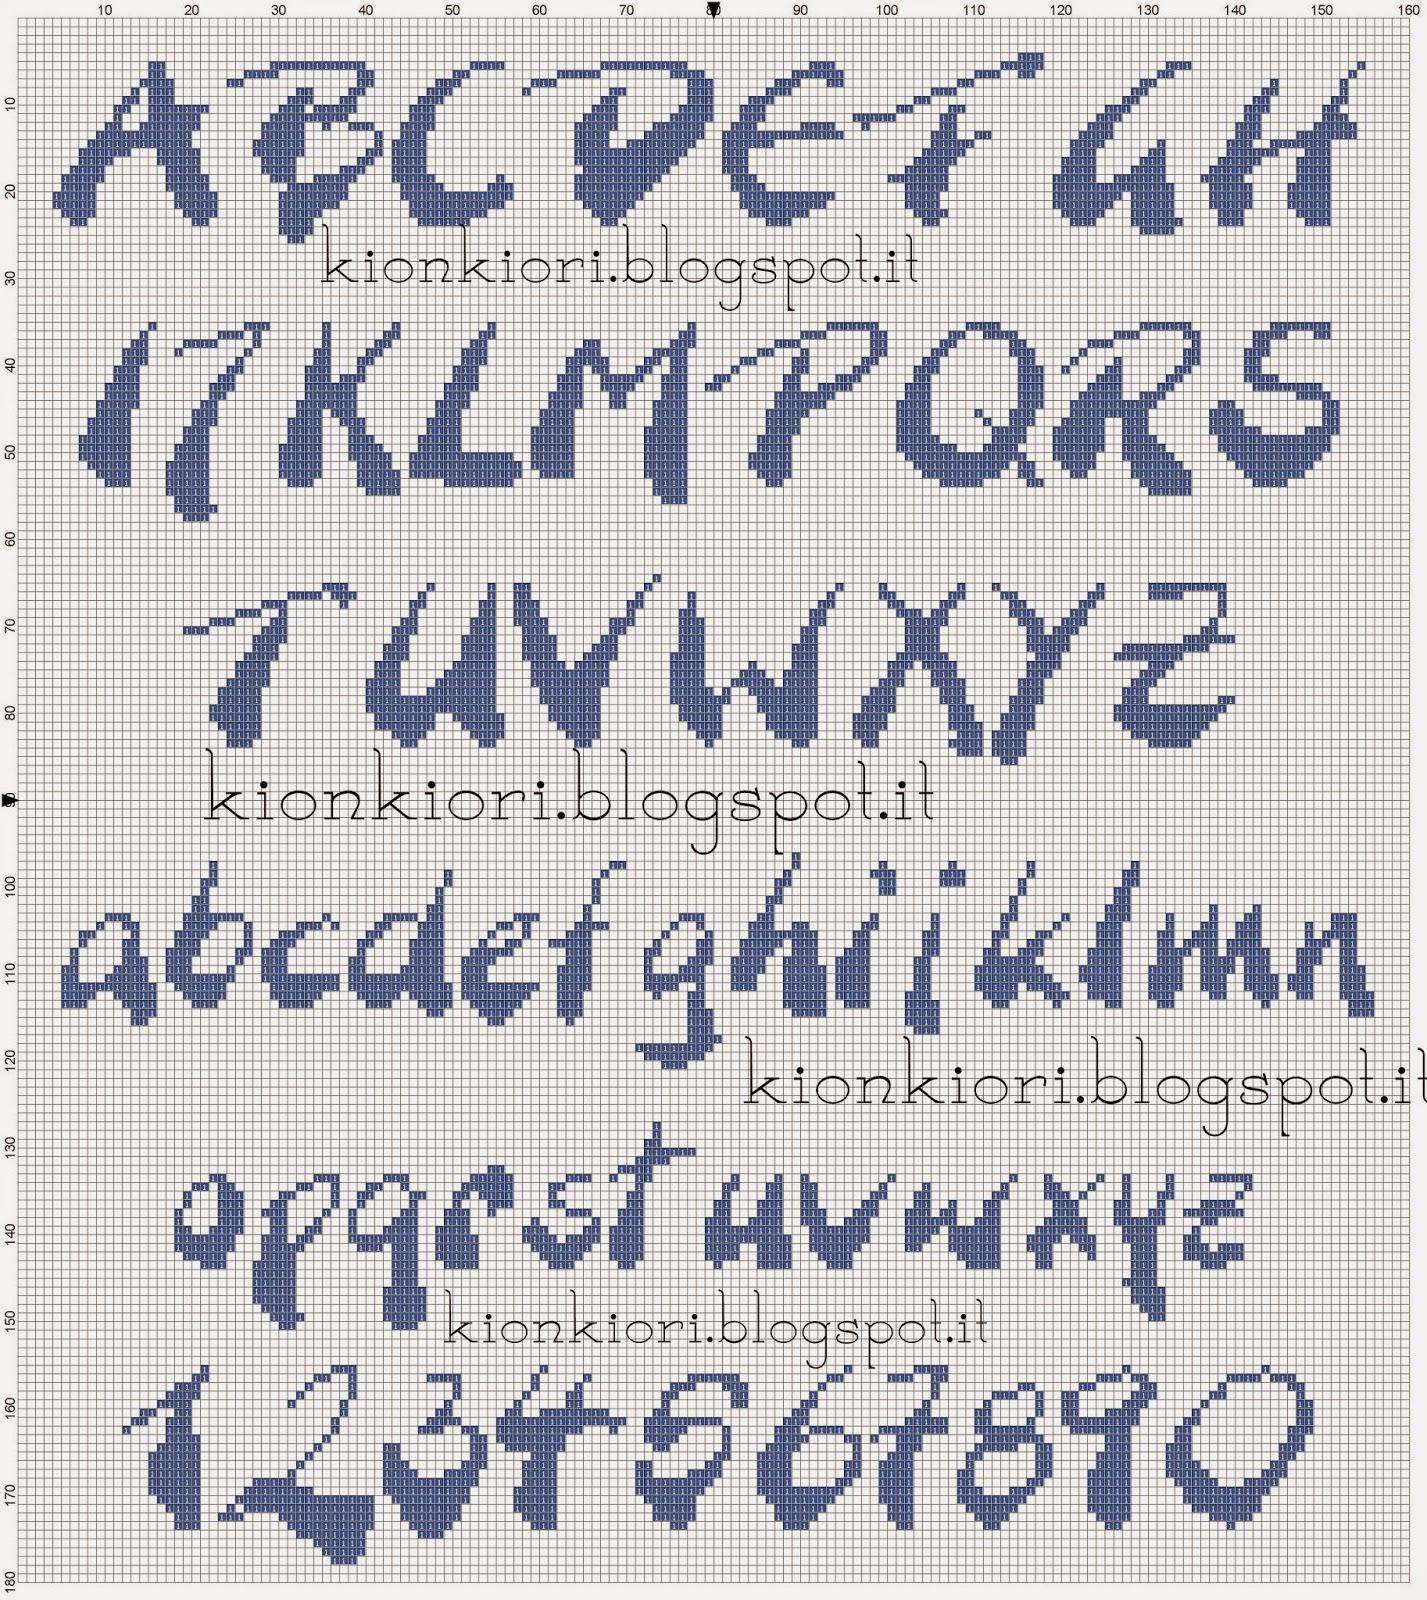 Kionkiori punto croce un due tre alfabeti for Alfabeto disney a punto croce